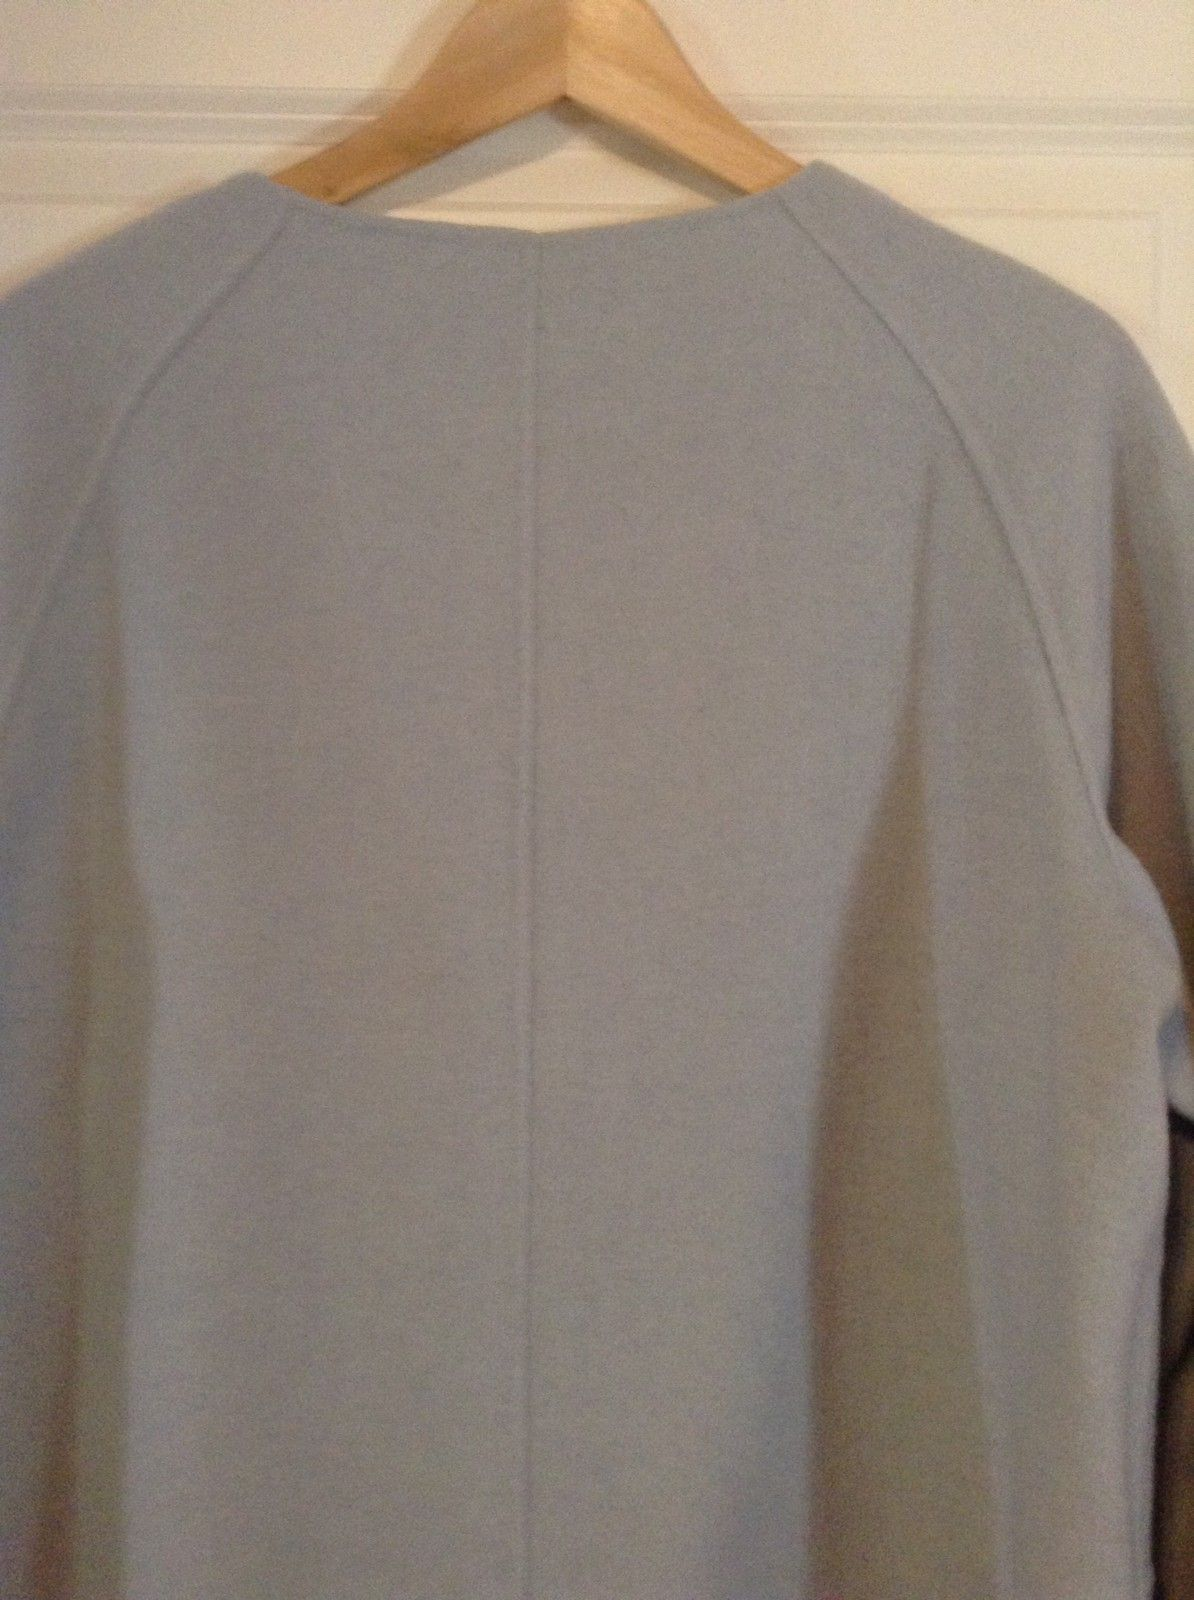 adfe1660 Betty Barclay kåpe/jakke i lyseblå ullstoff | FINN.no